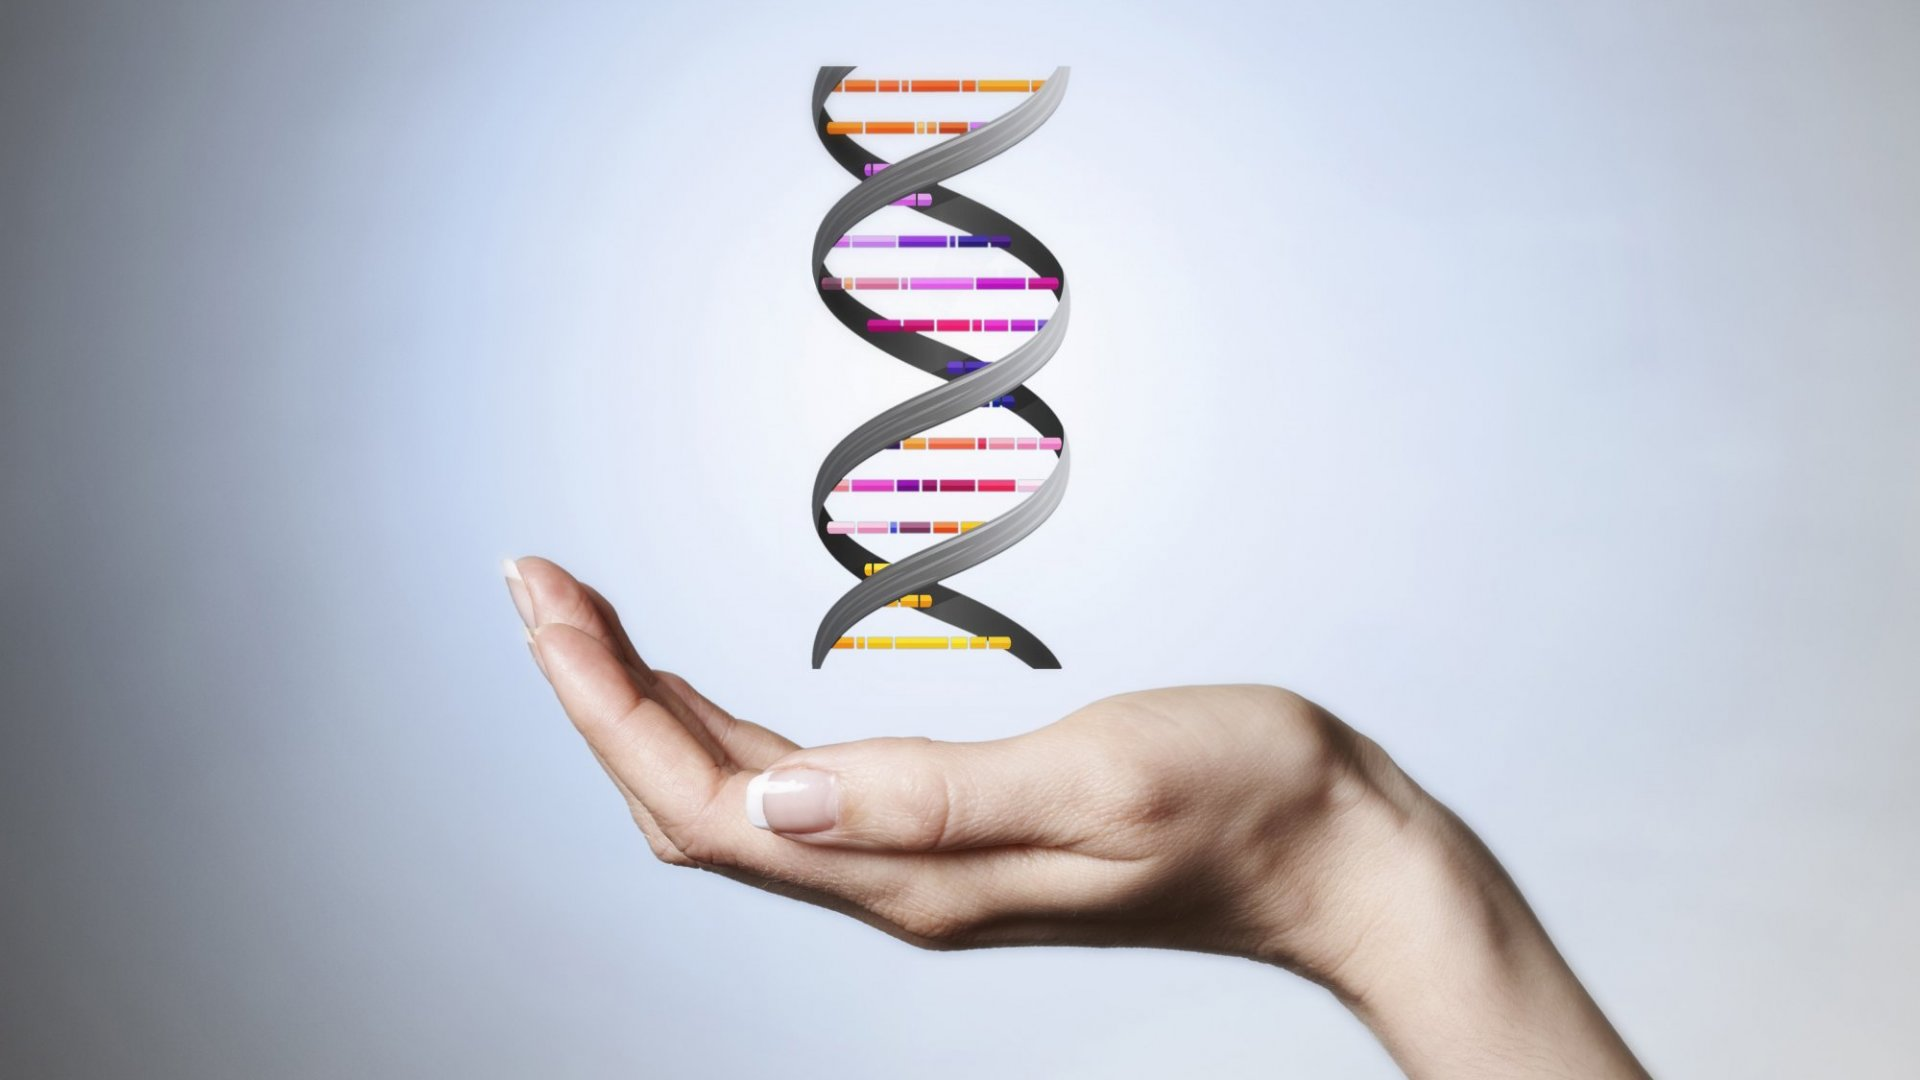 Home Saliva Test Kit Screens for Breast Cancer Genes